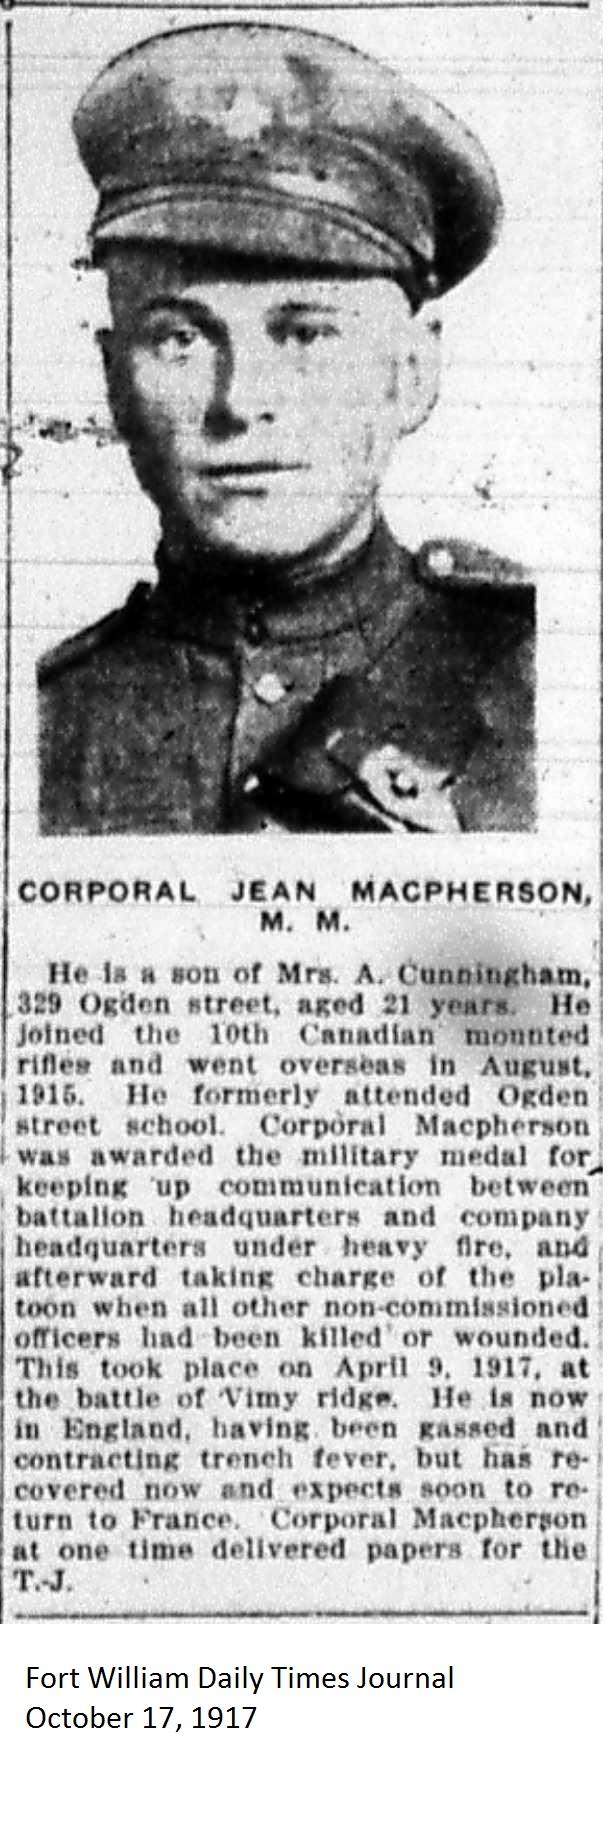 FWDTJ October 17, 1917 - MacPherson